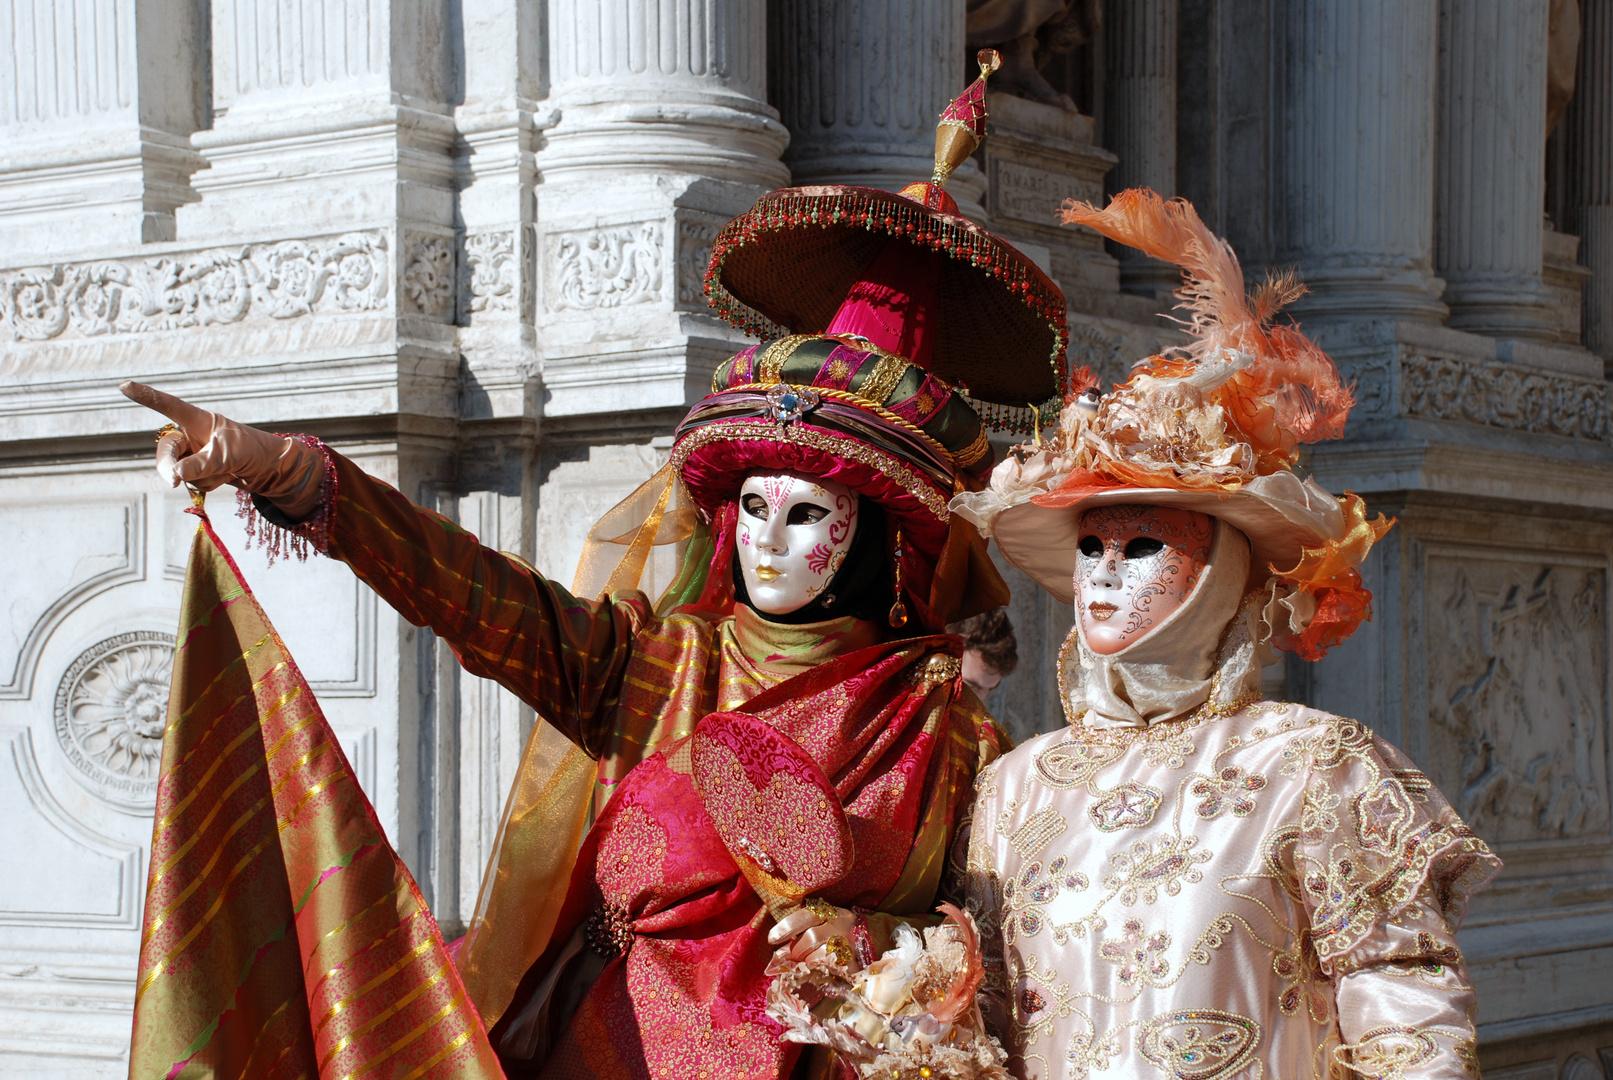 da schau, der Carnevale naht ...